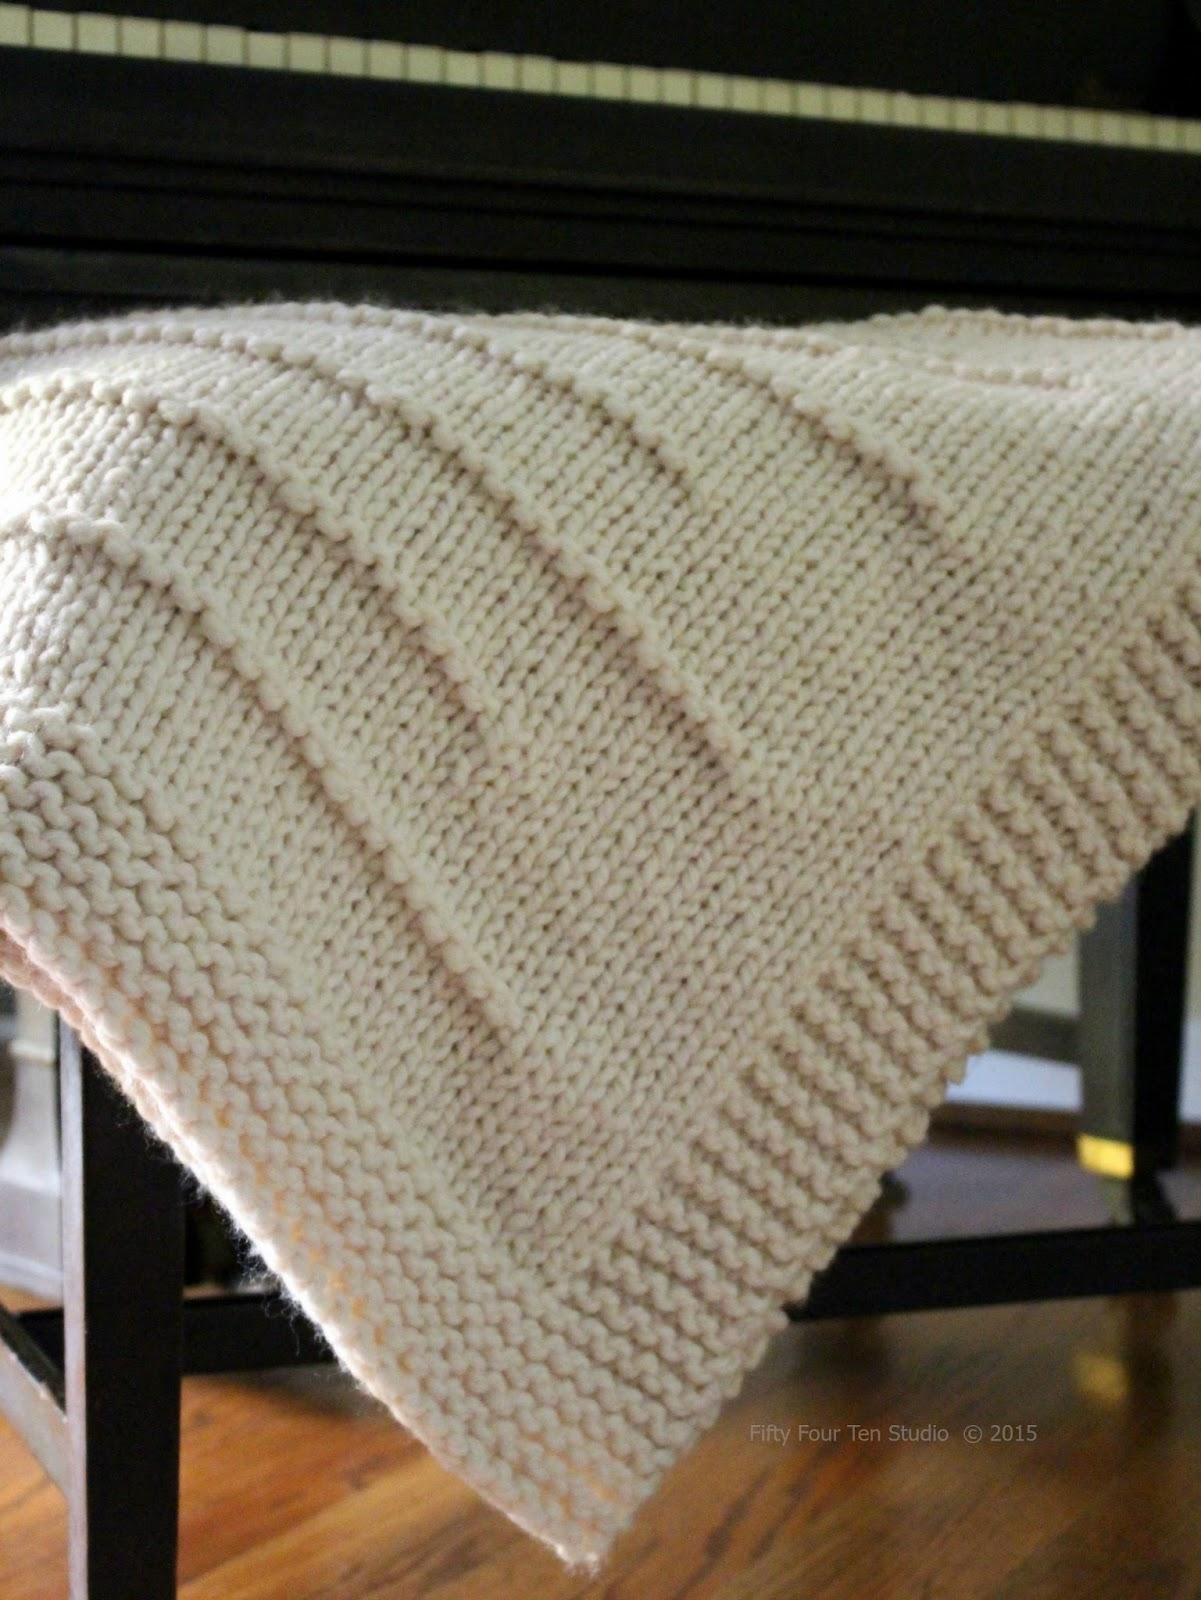 Fifty Four Ten Studio: State Line Blanket Knitting Pattern